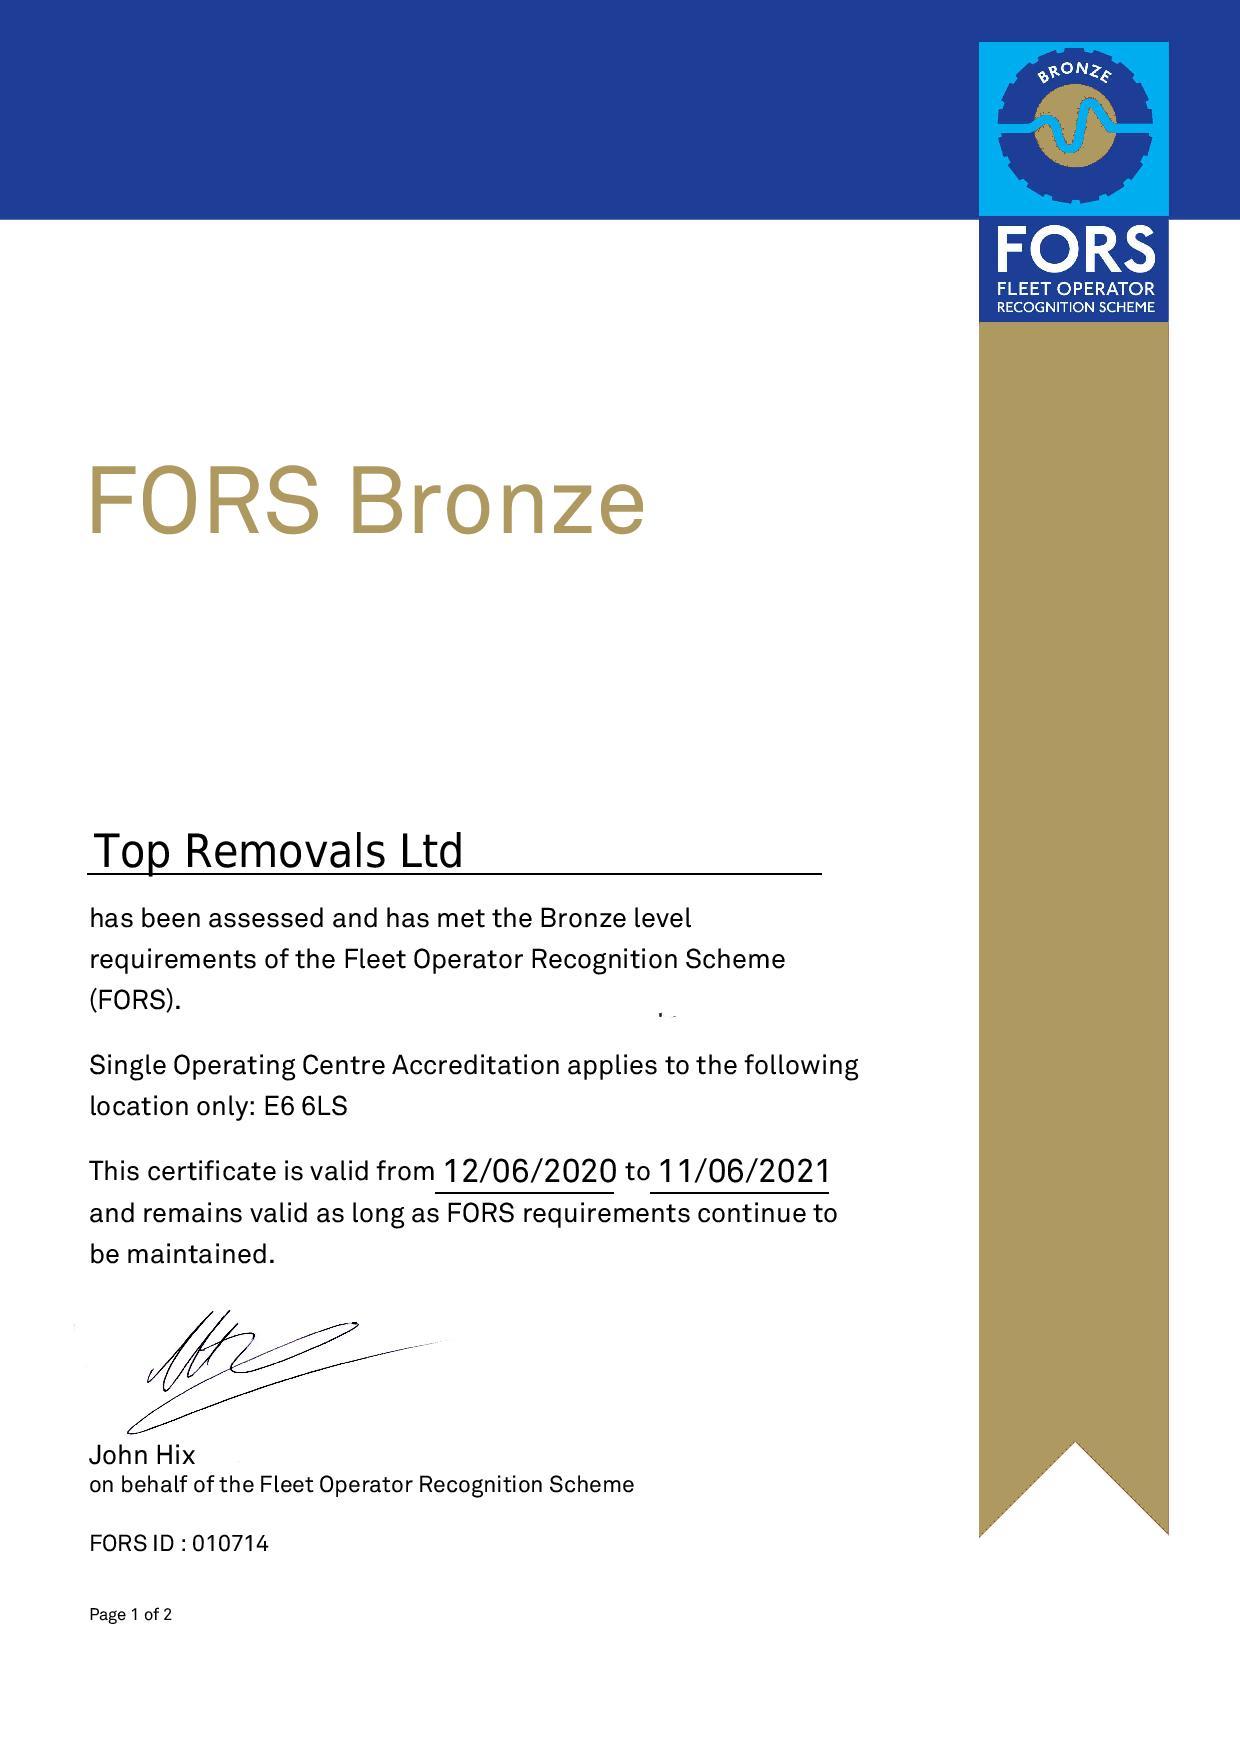 FORS Bronze Certificate Top Removals Ltd